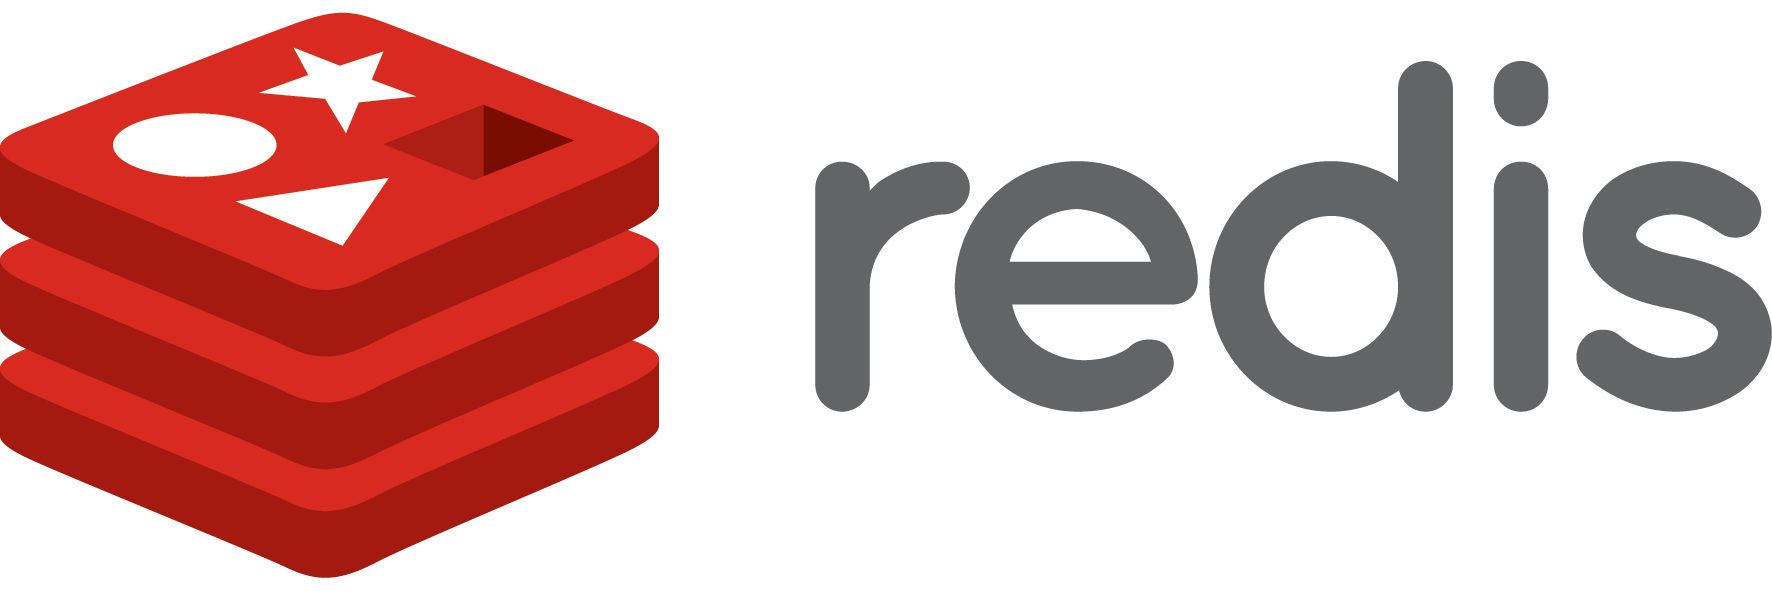 Partner - Redis Logo